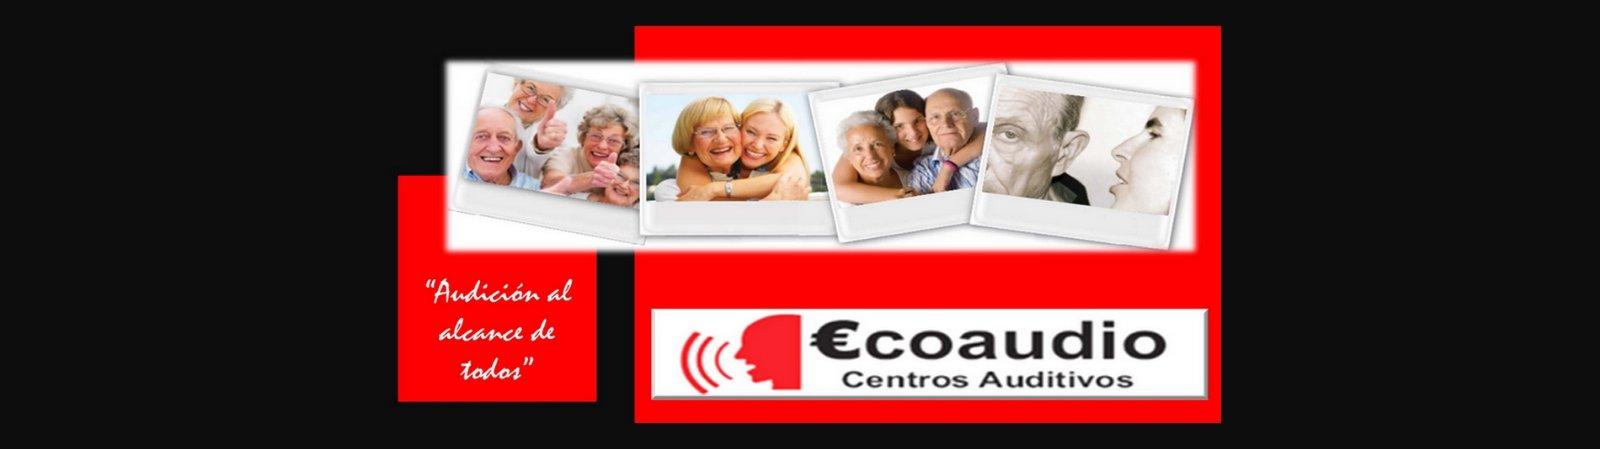 Ecoaudio Centros Auditivos, Audifonos- Centro auditivo- Ayudas tecnicas- Centro sanitario- Revisiones Auditivas- Aparatos para sordera- ortopedias- Consultoria audiologica- Productos Audiologicos- Oftalmologos.